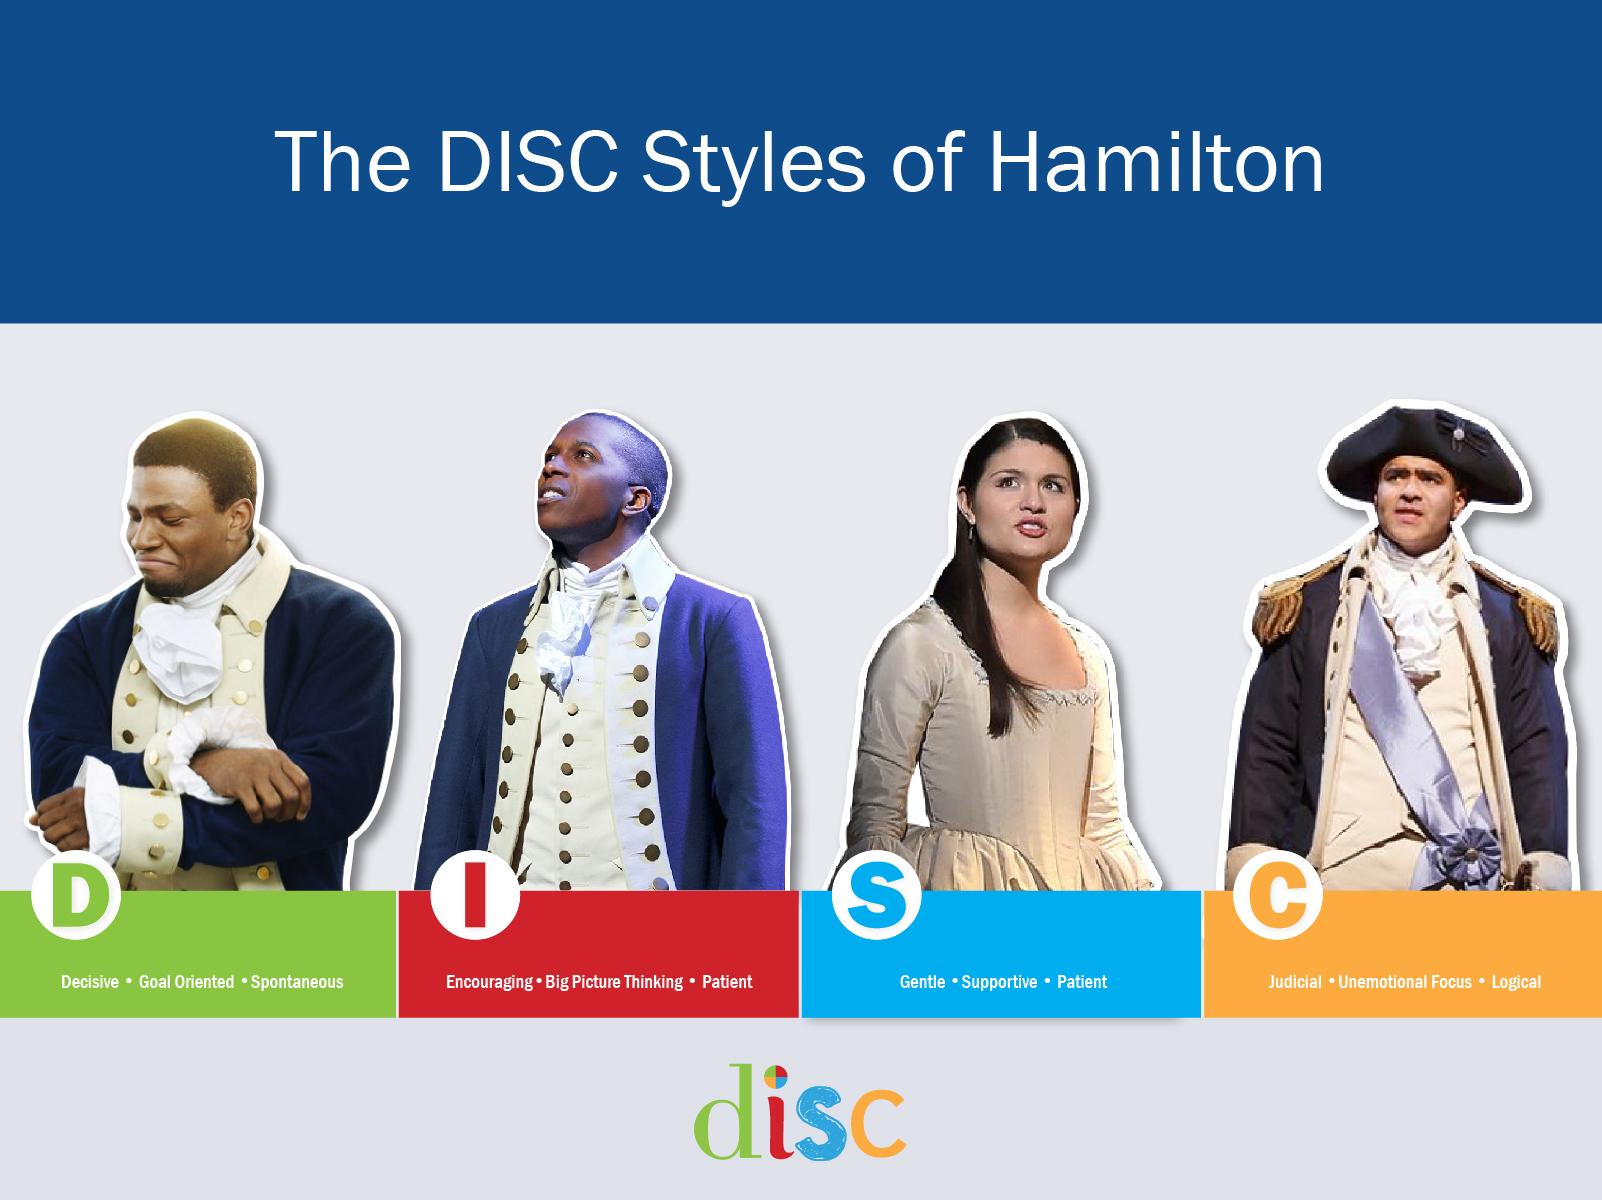 Hamilton DISC Styles